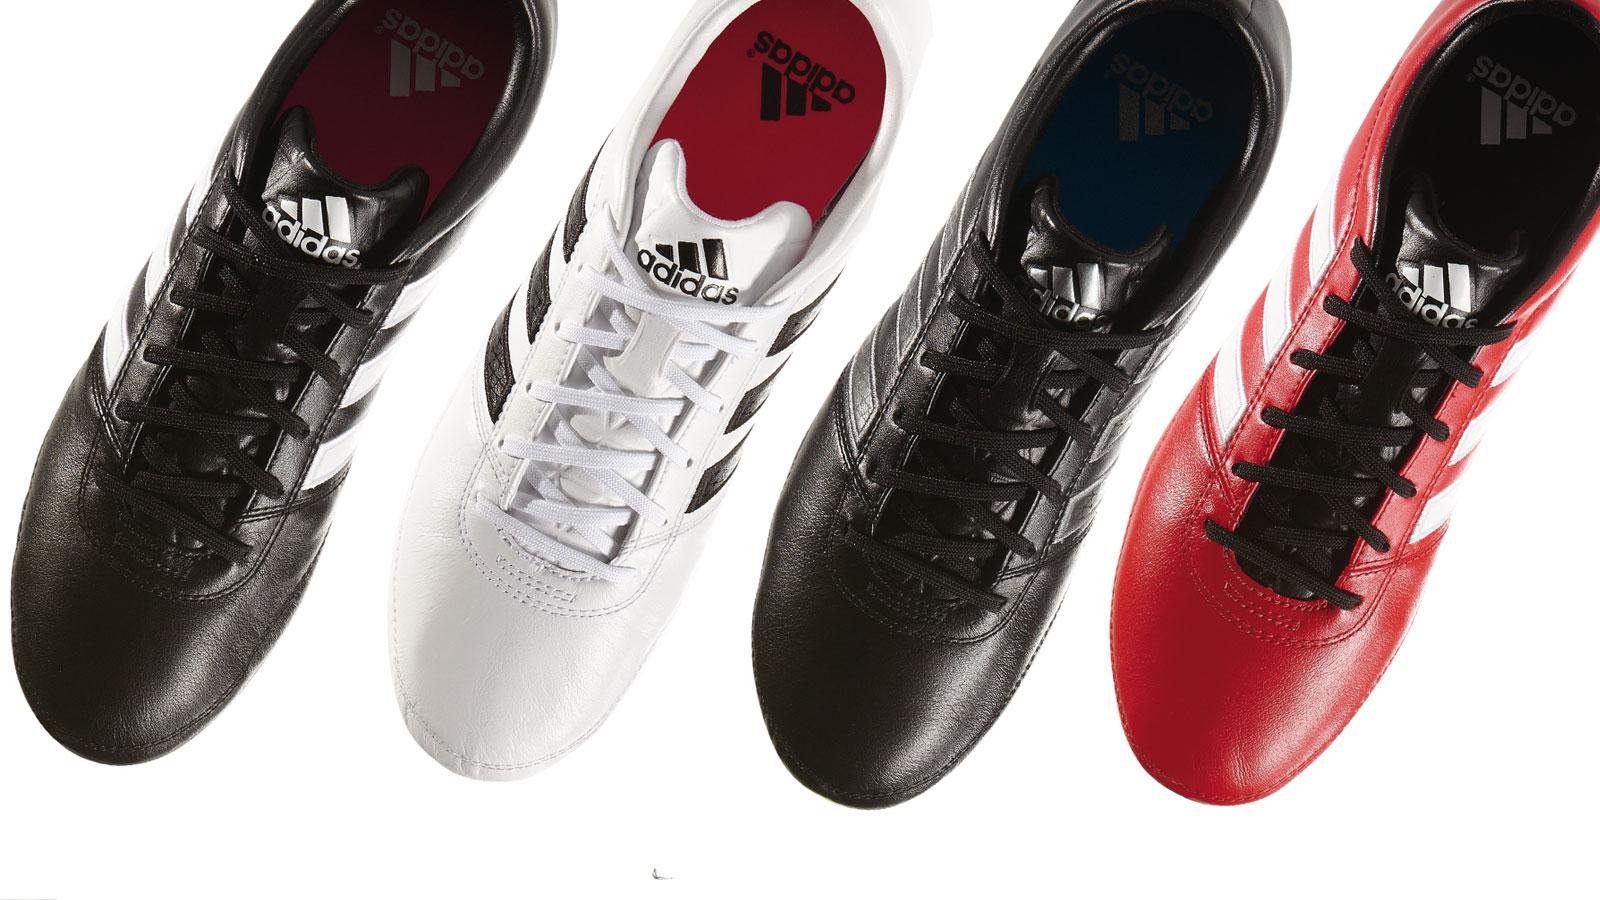 Adidas Gloro 16 Schuhe (Gloro 16.1 FG)